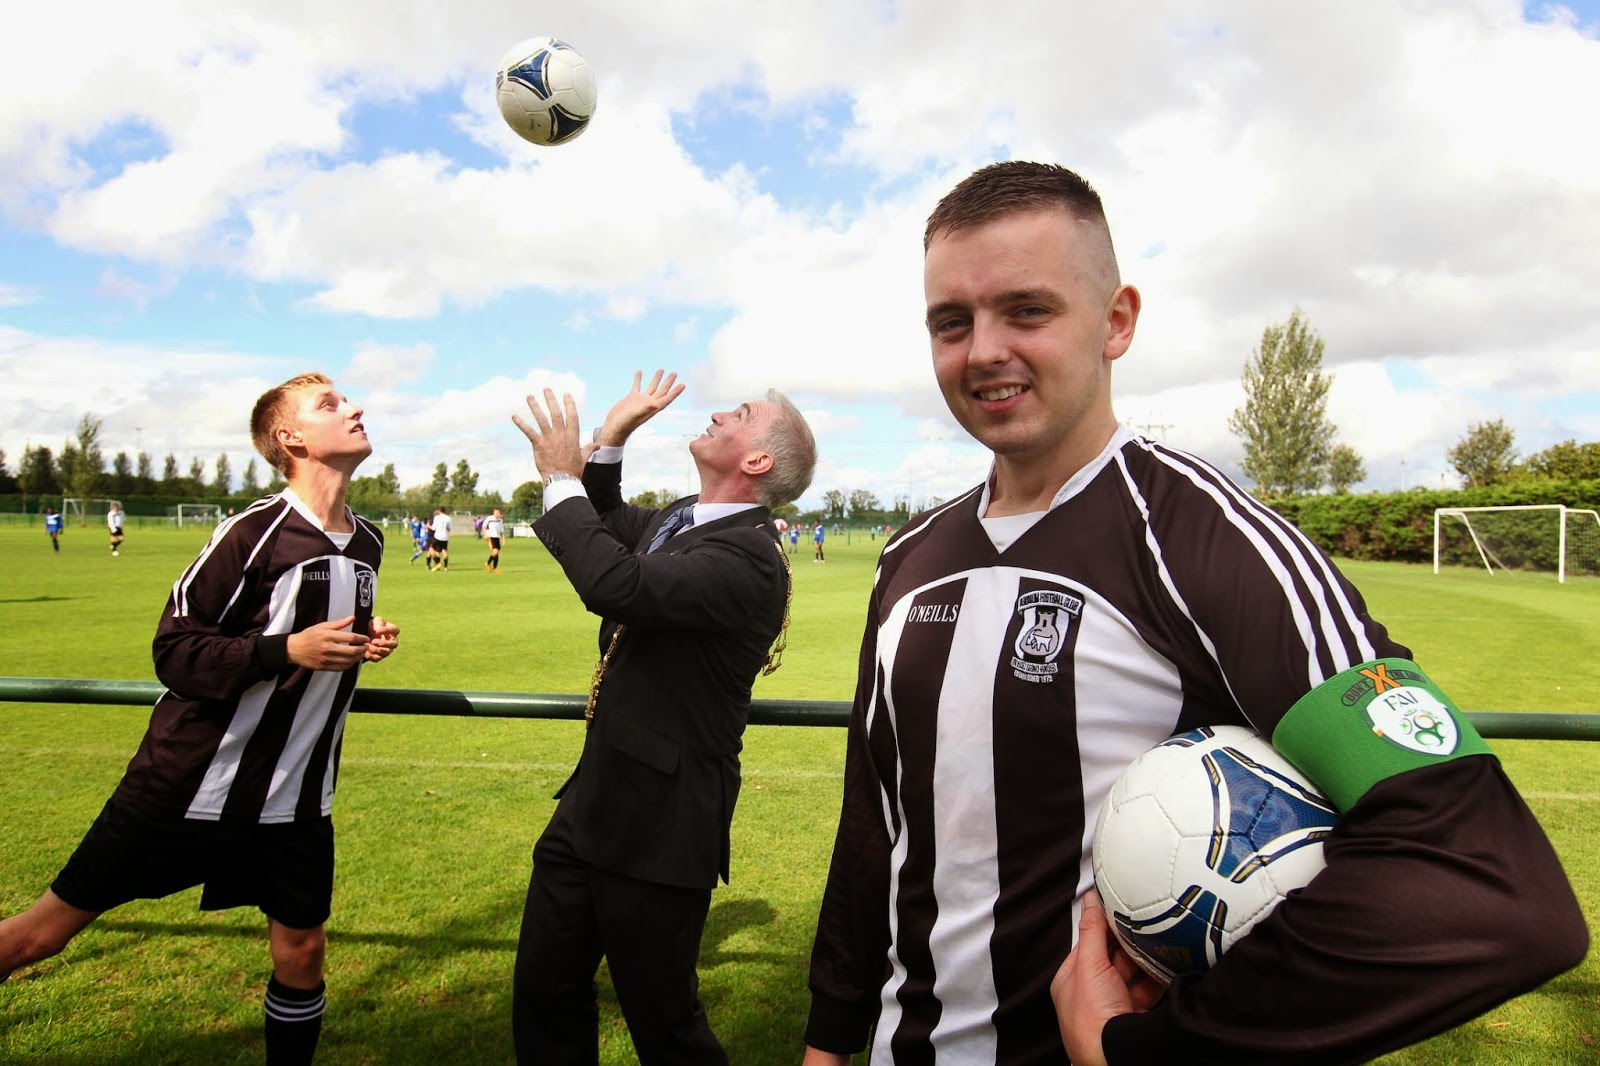 Fingal Festival of Football